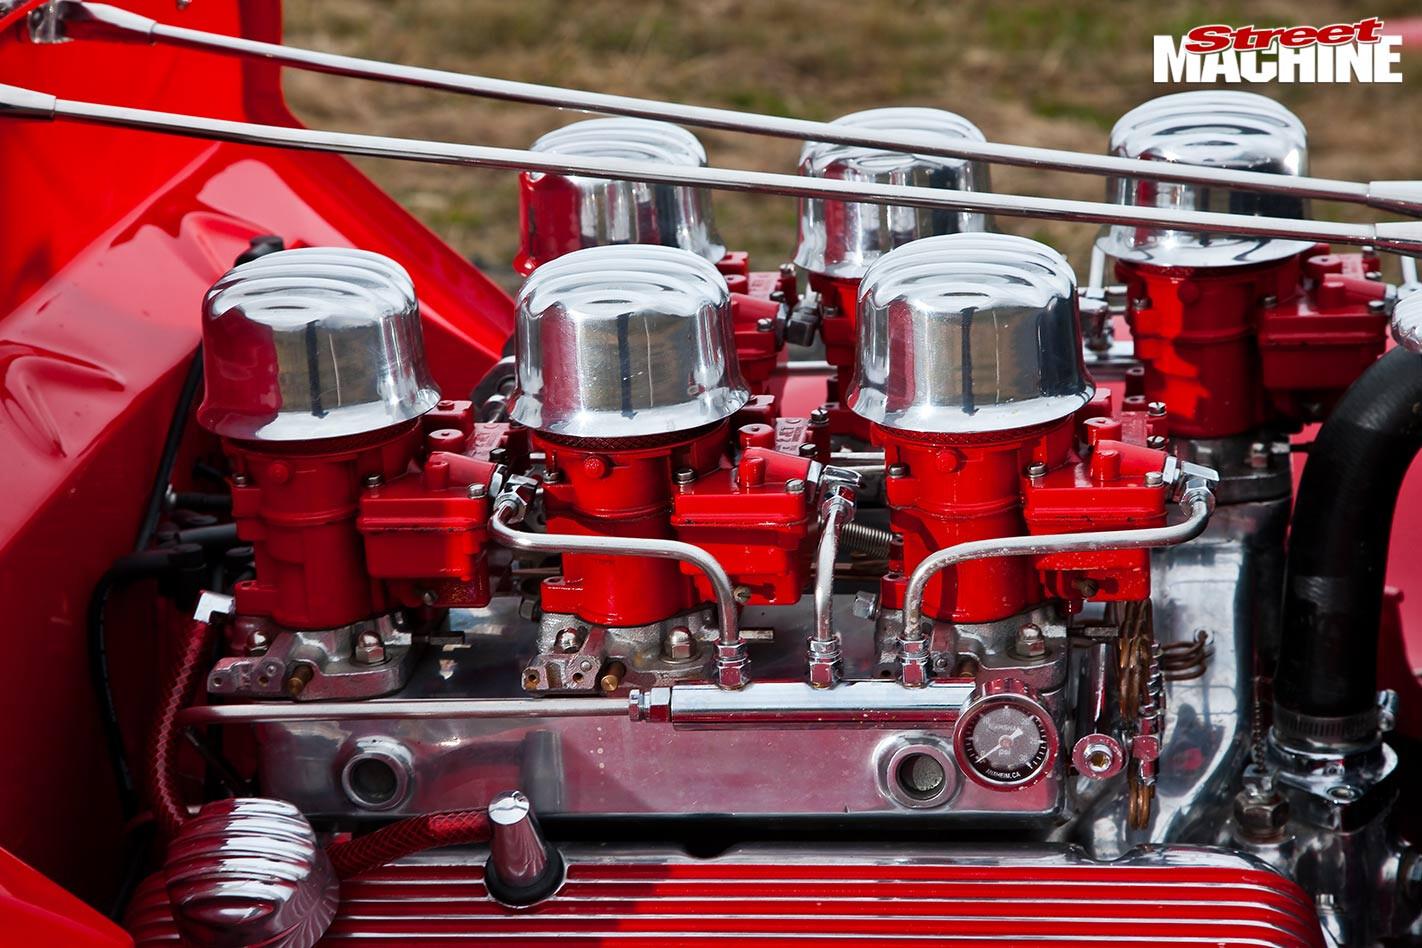 Ford Tudor engine